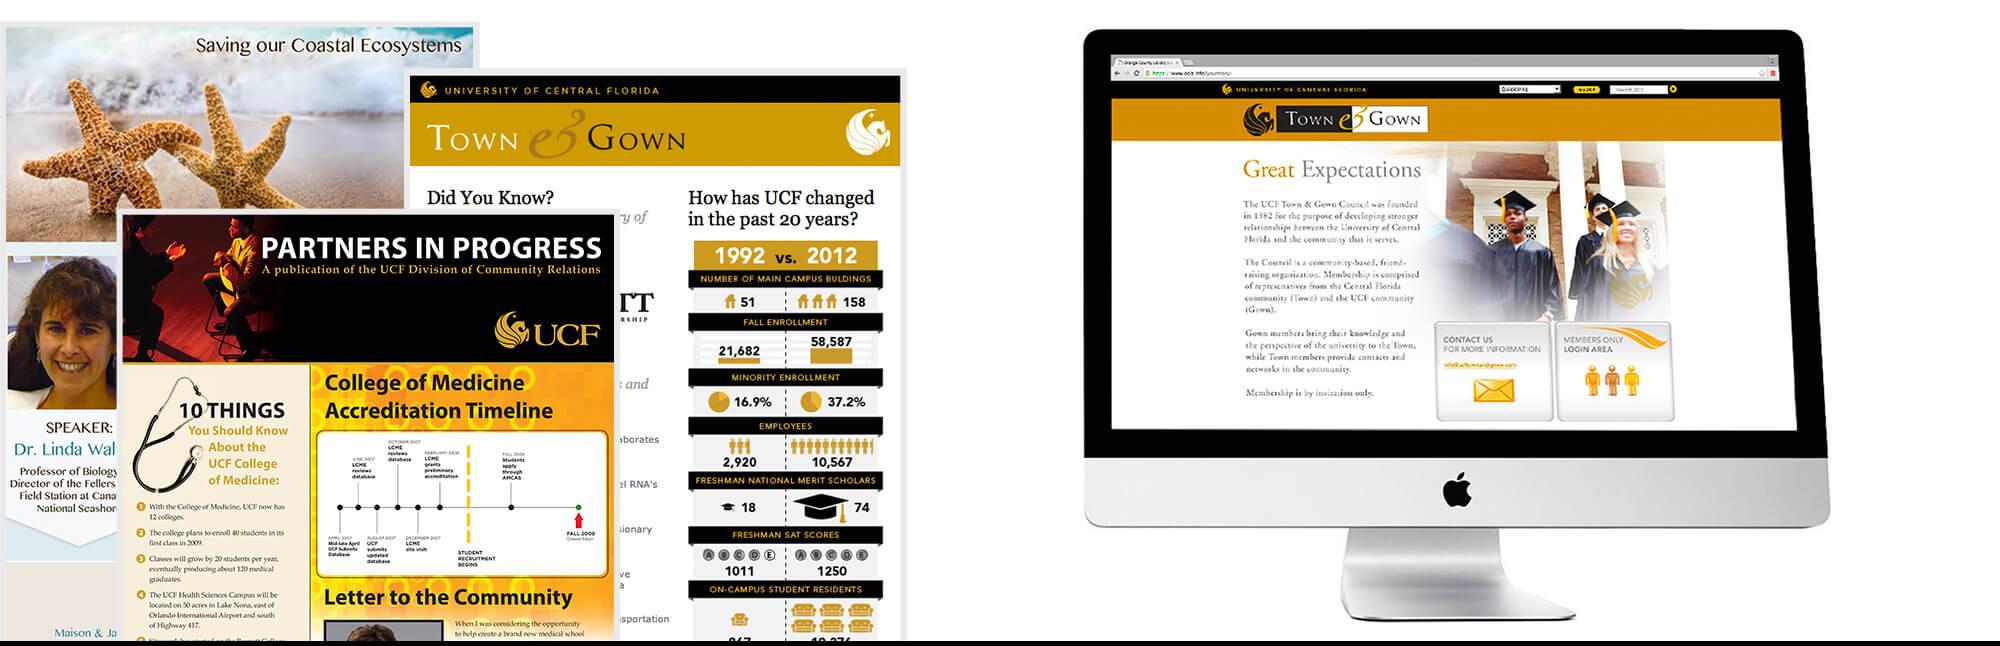 Higher Education Marketing Agency | Appleton Creative